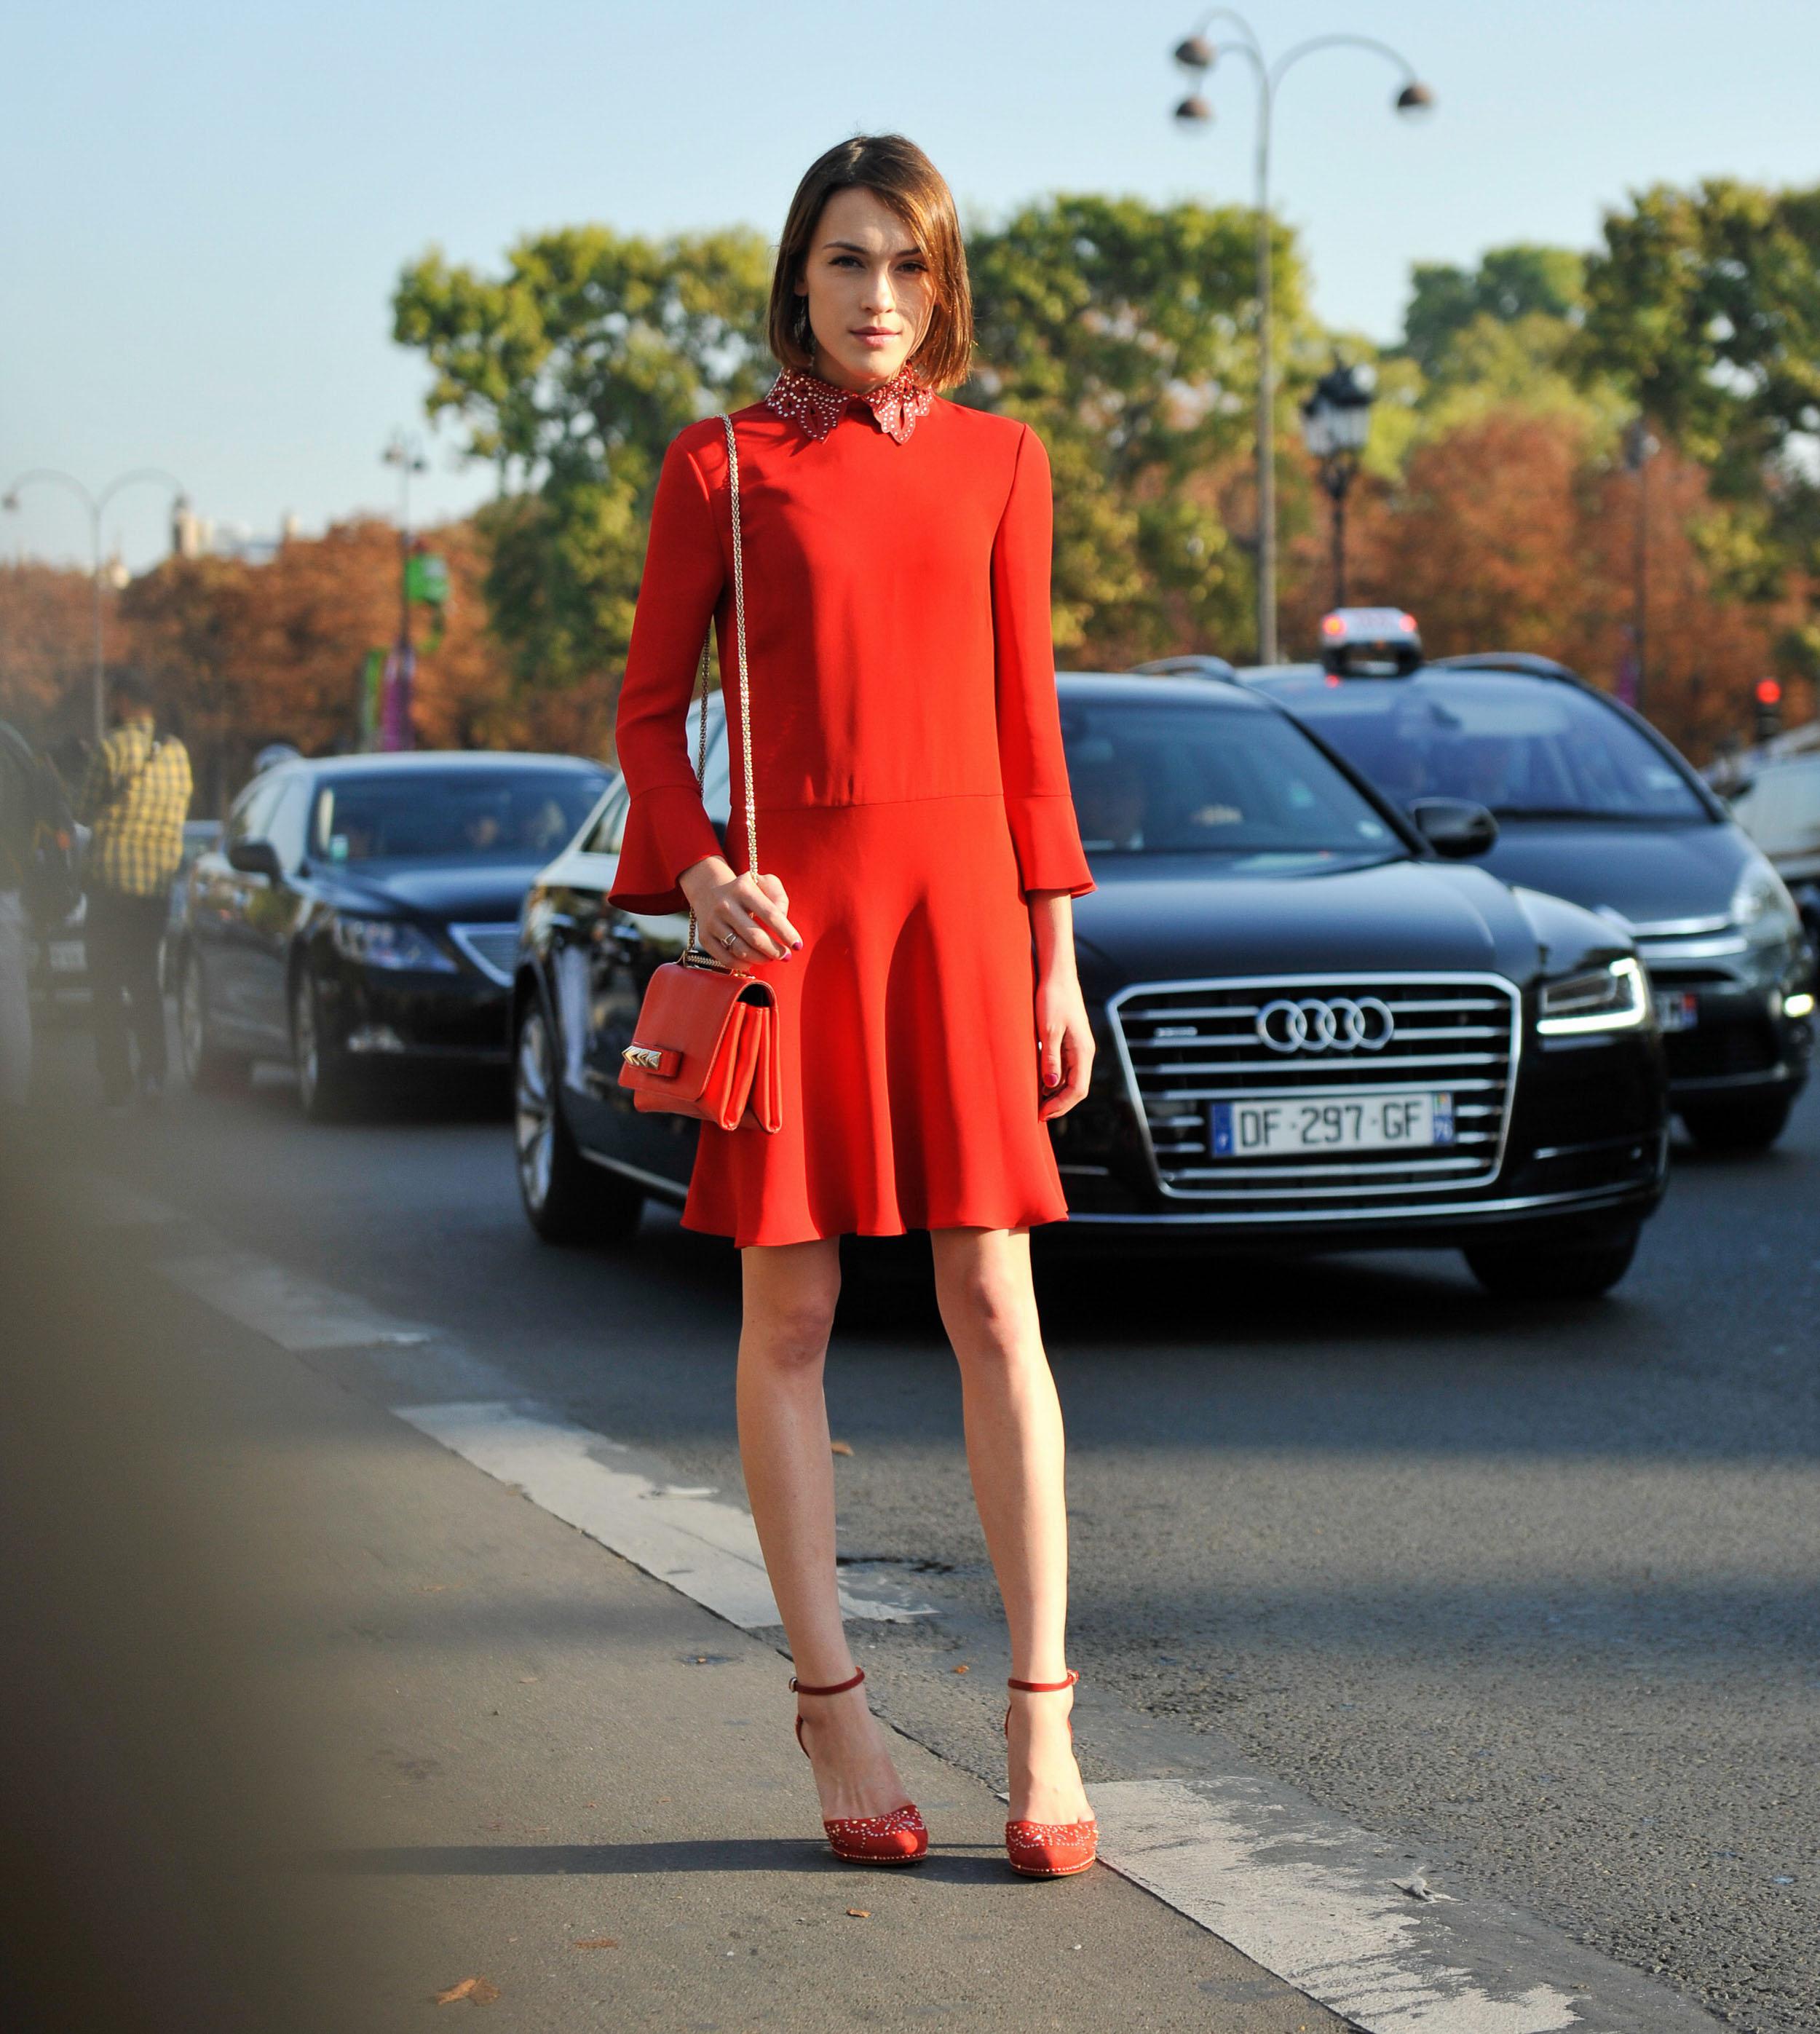 StreetStyle_ParisFashionWeek_LeandroJusten_036.jpg